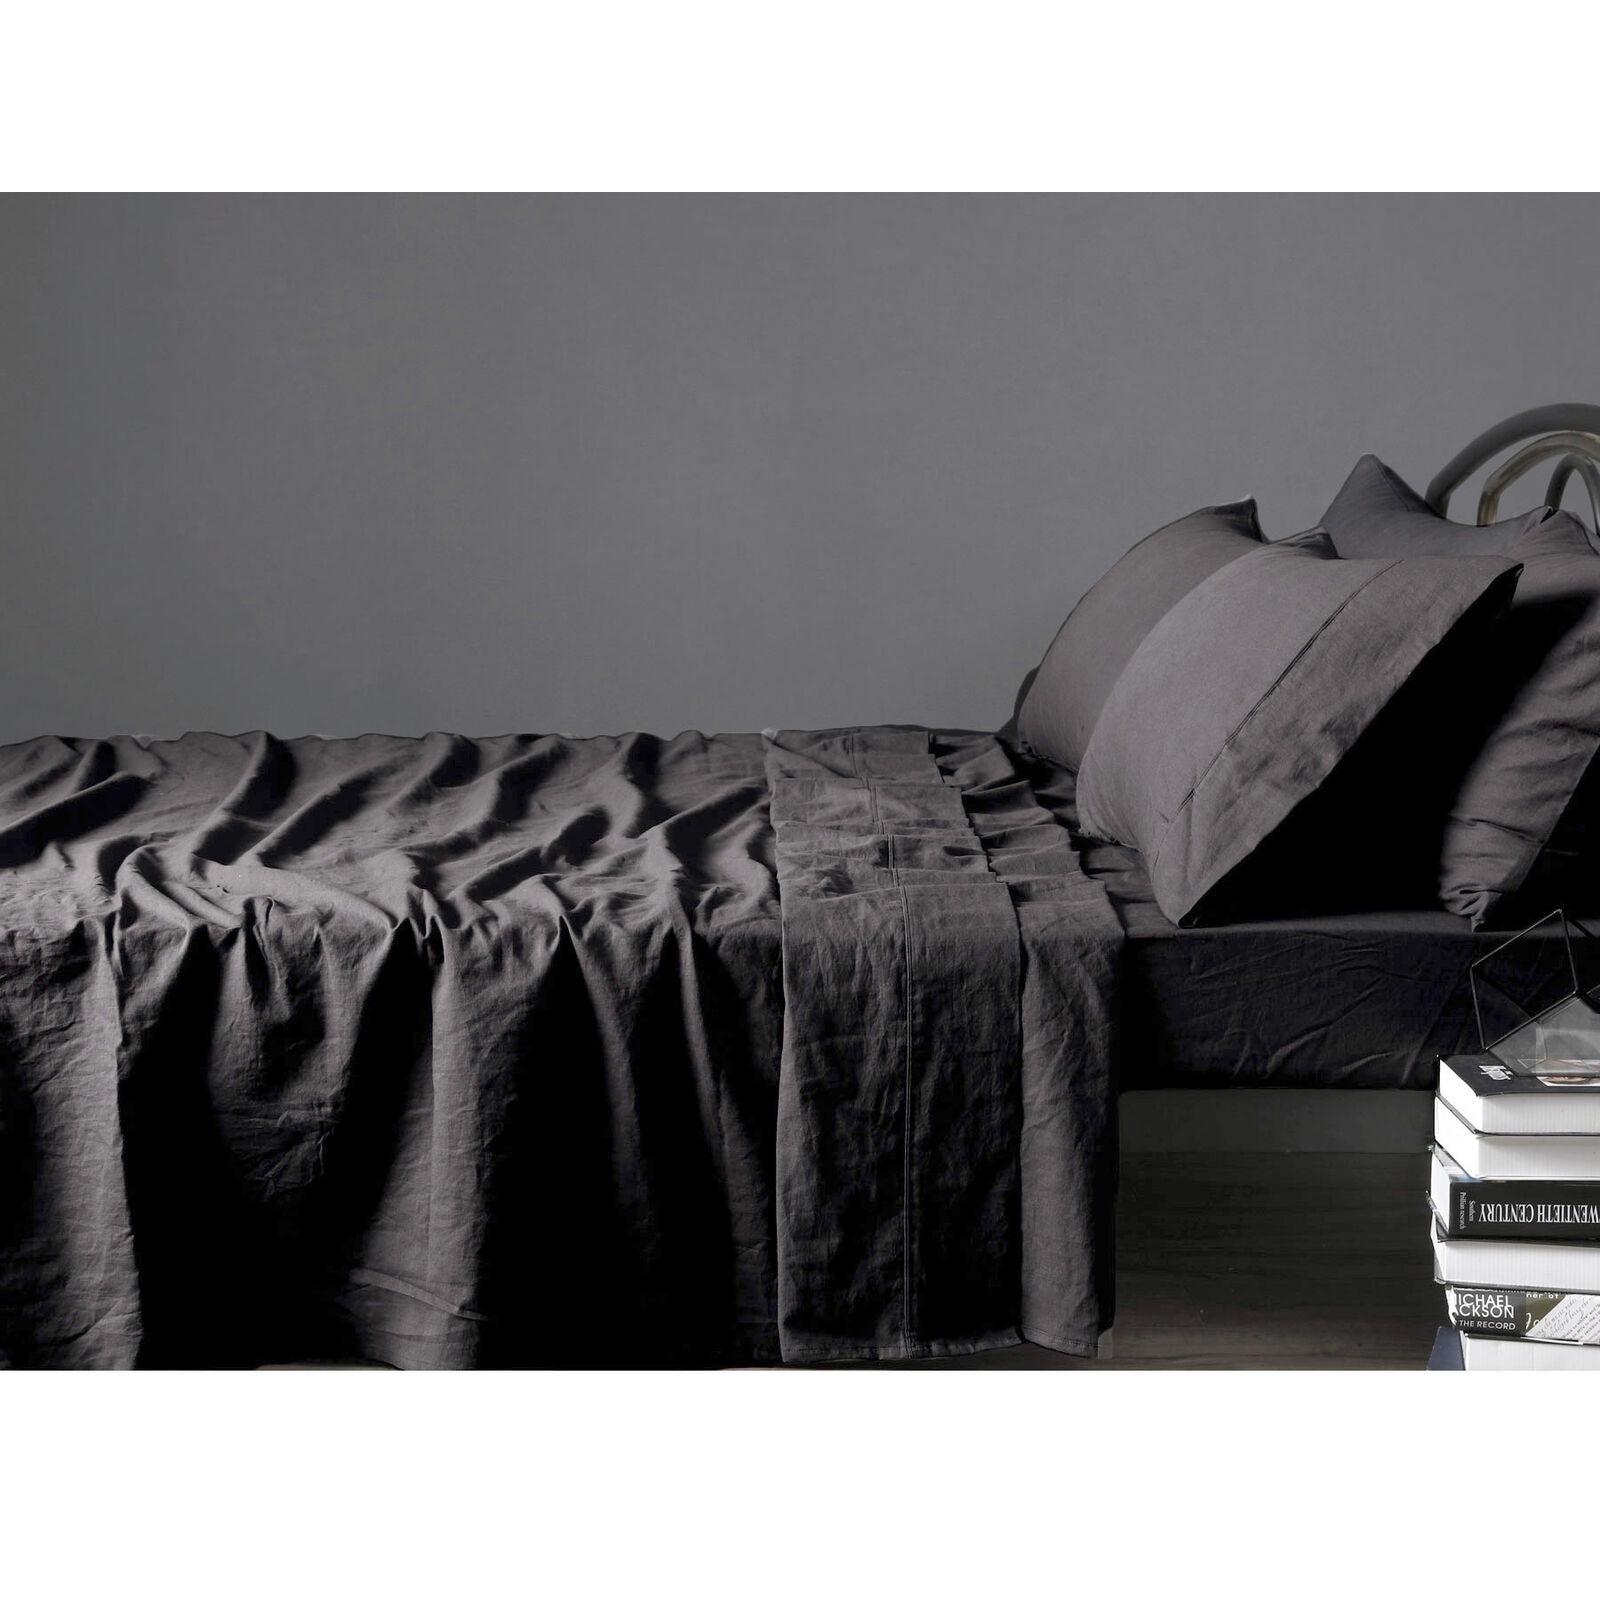 4 Pce 100%  Pure Linen SLATE Sheet Set by Vintage Design Homewares - QUEEN KING